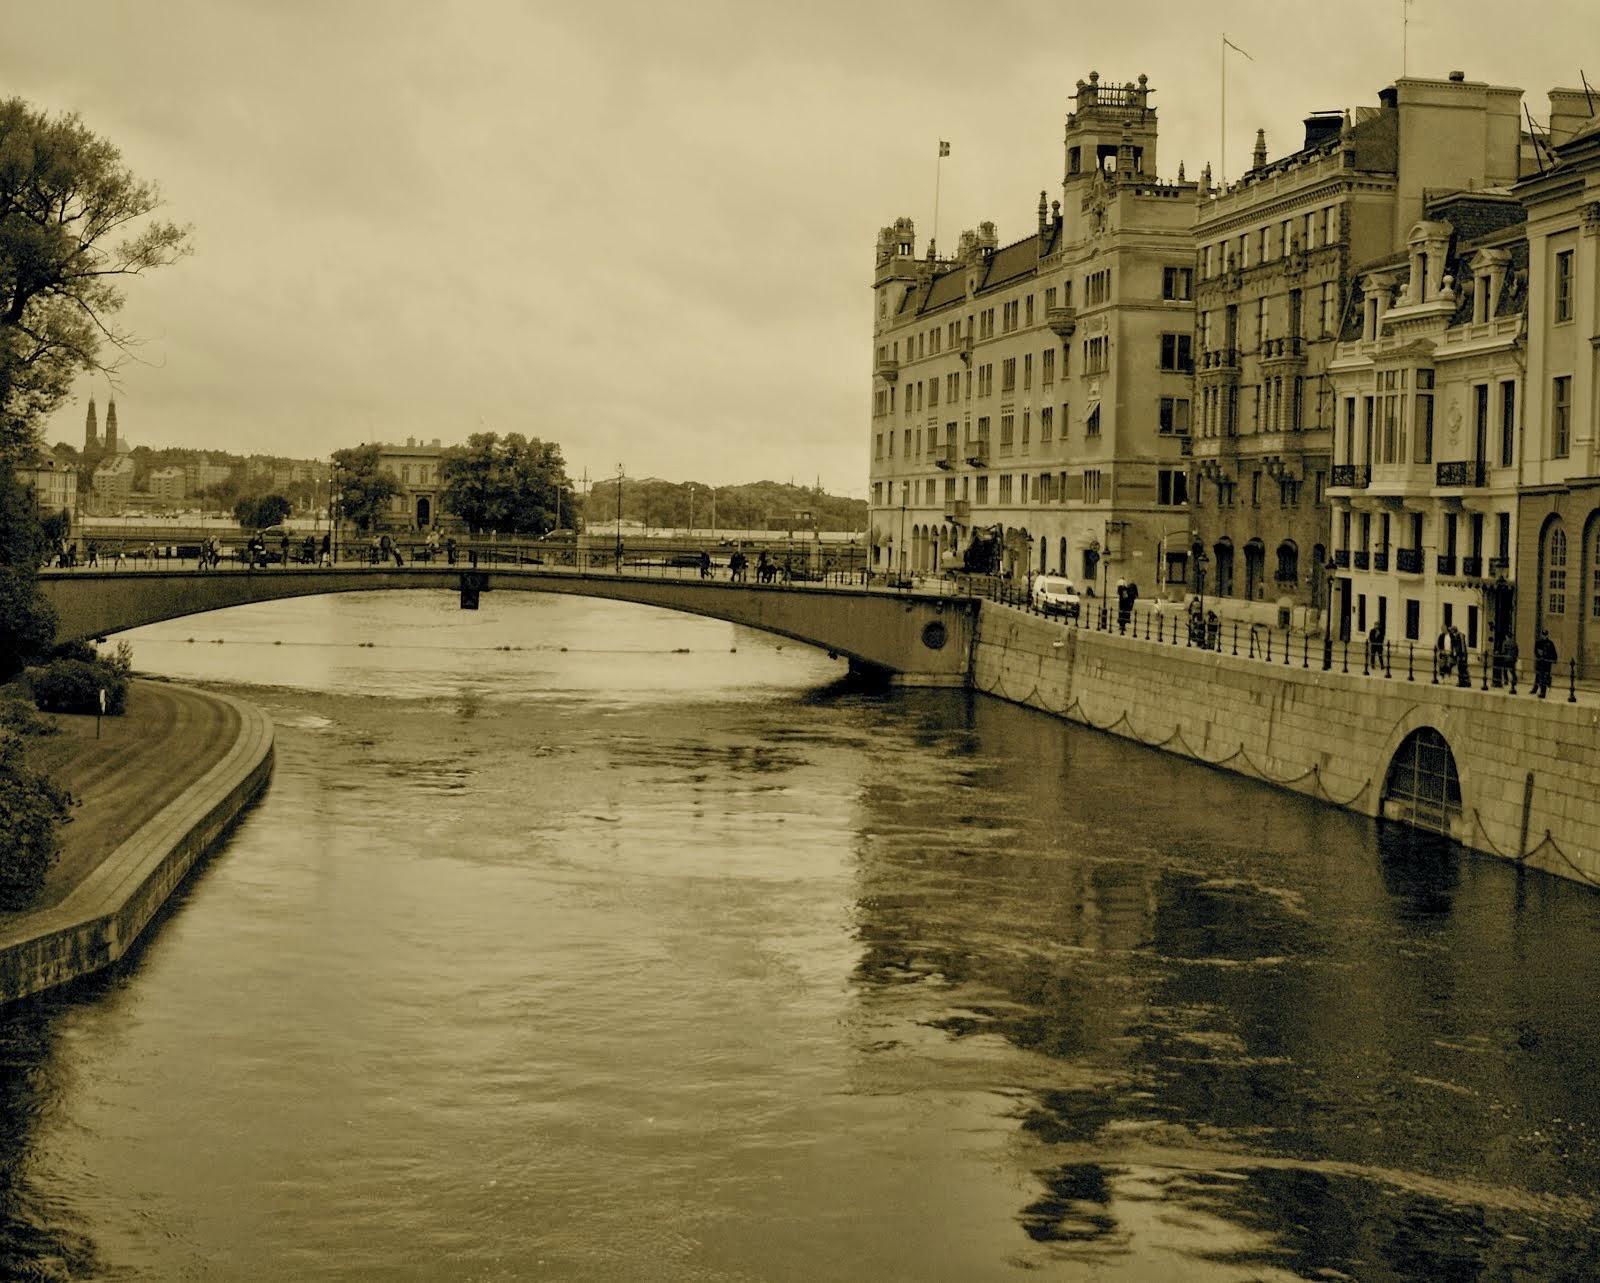 City of Bridges, City of Canals